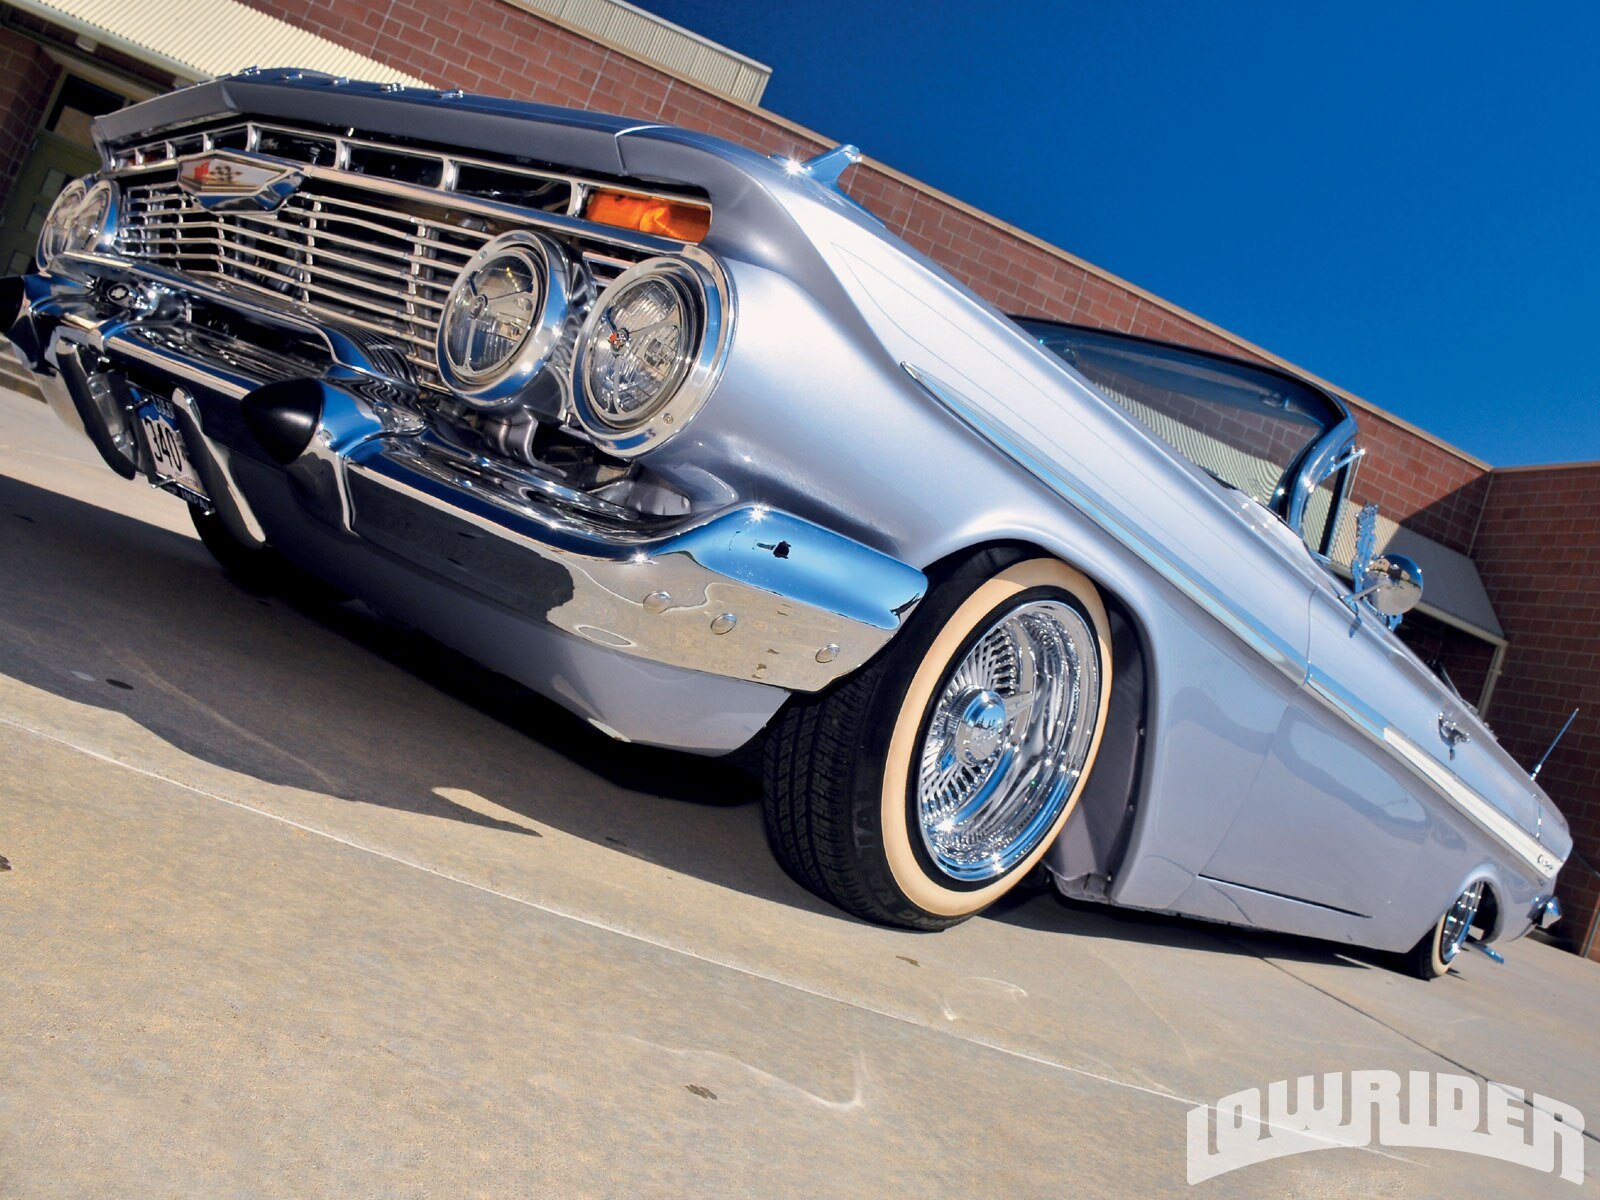 lrmp_1101_02_o-1961_chevrolet_impala_convertible-front3